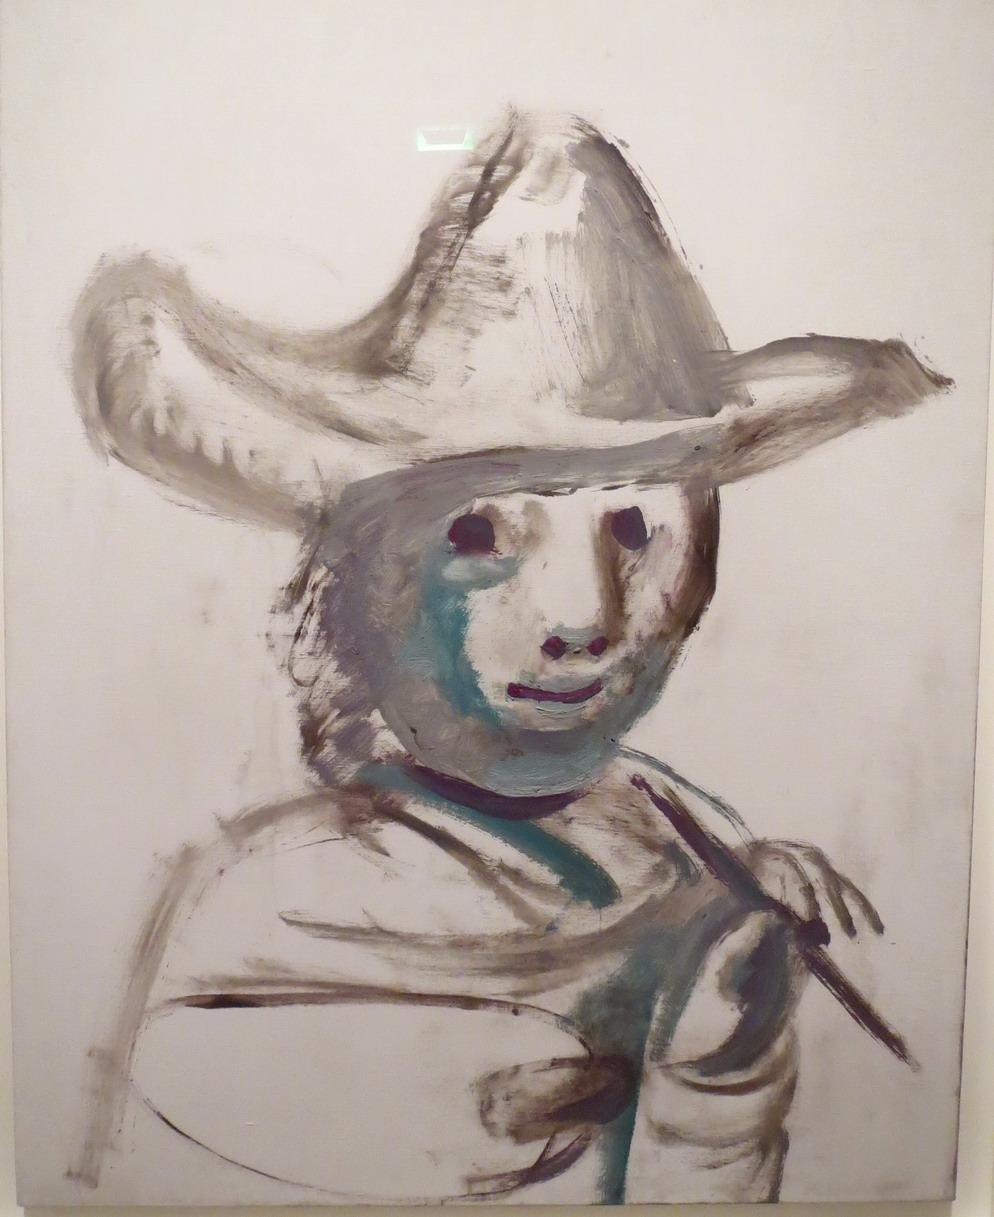 35. Picasso, expo à la Caixa cultural de Rio, le jeune peintre